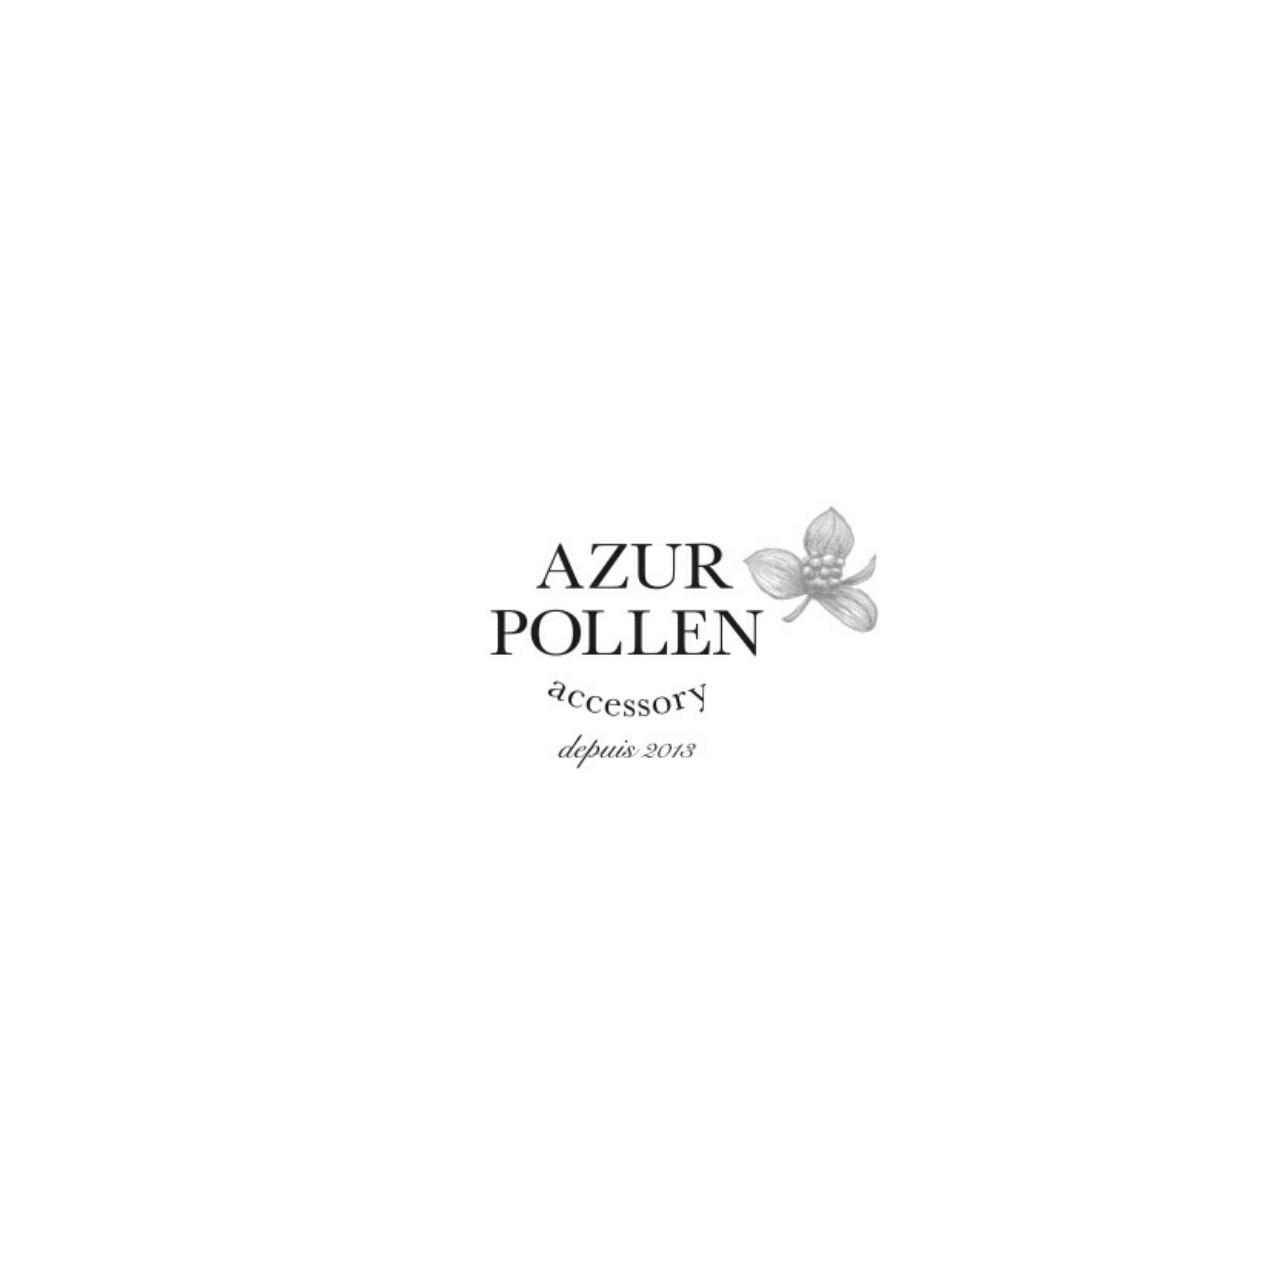 AZUR POLLEN ACCESSORY